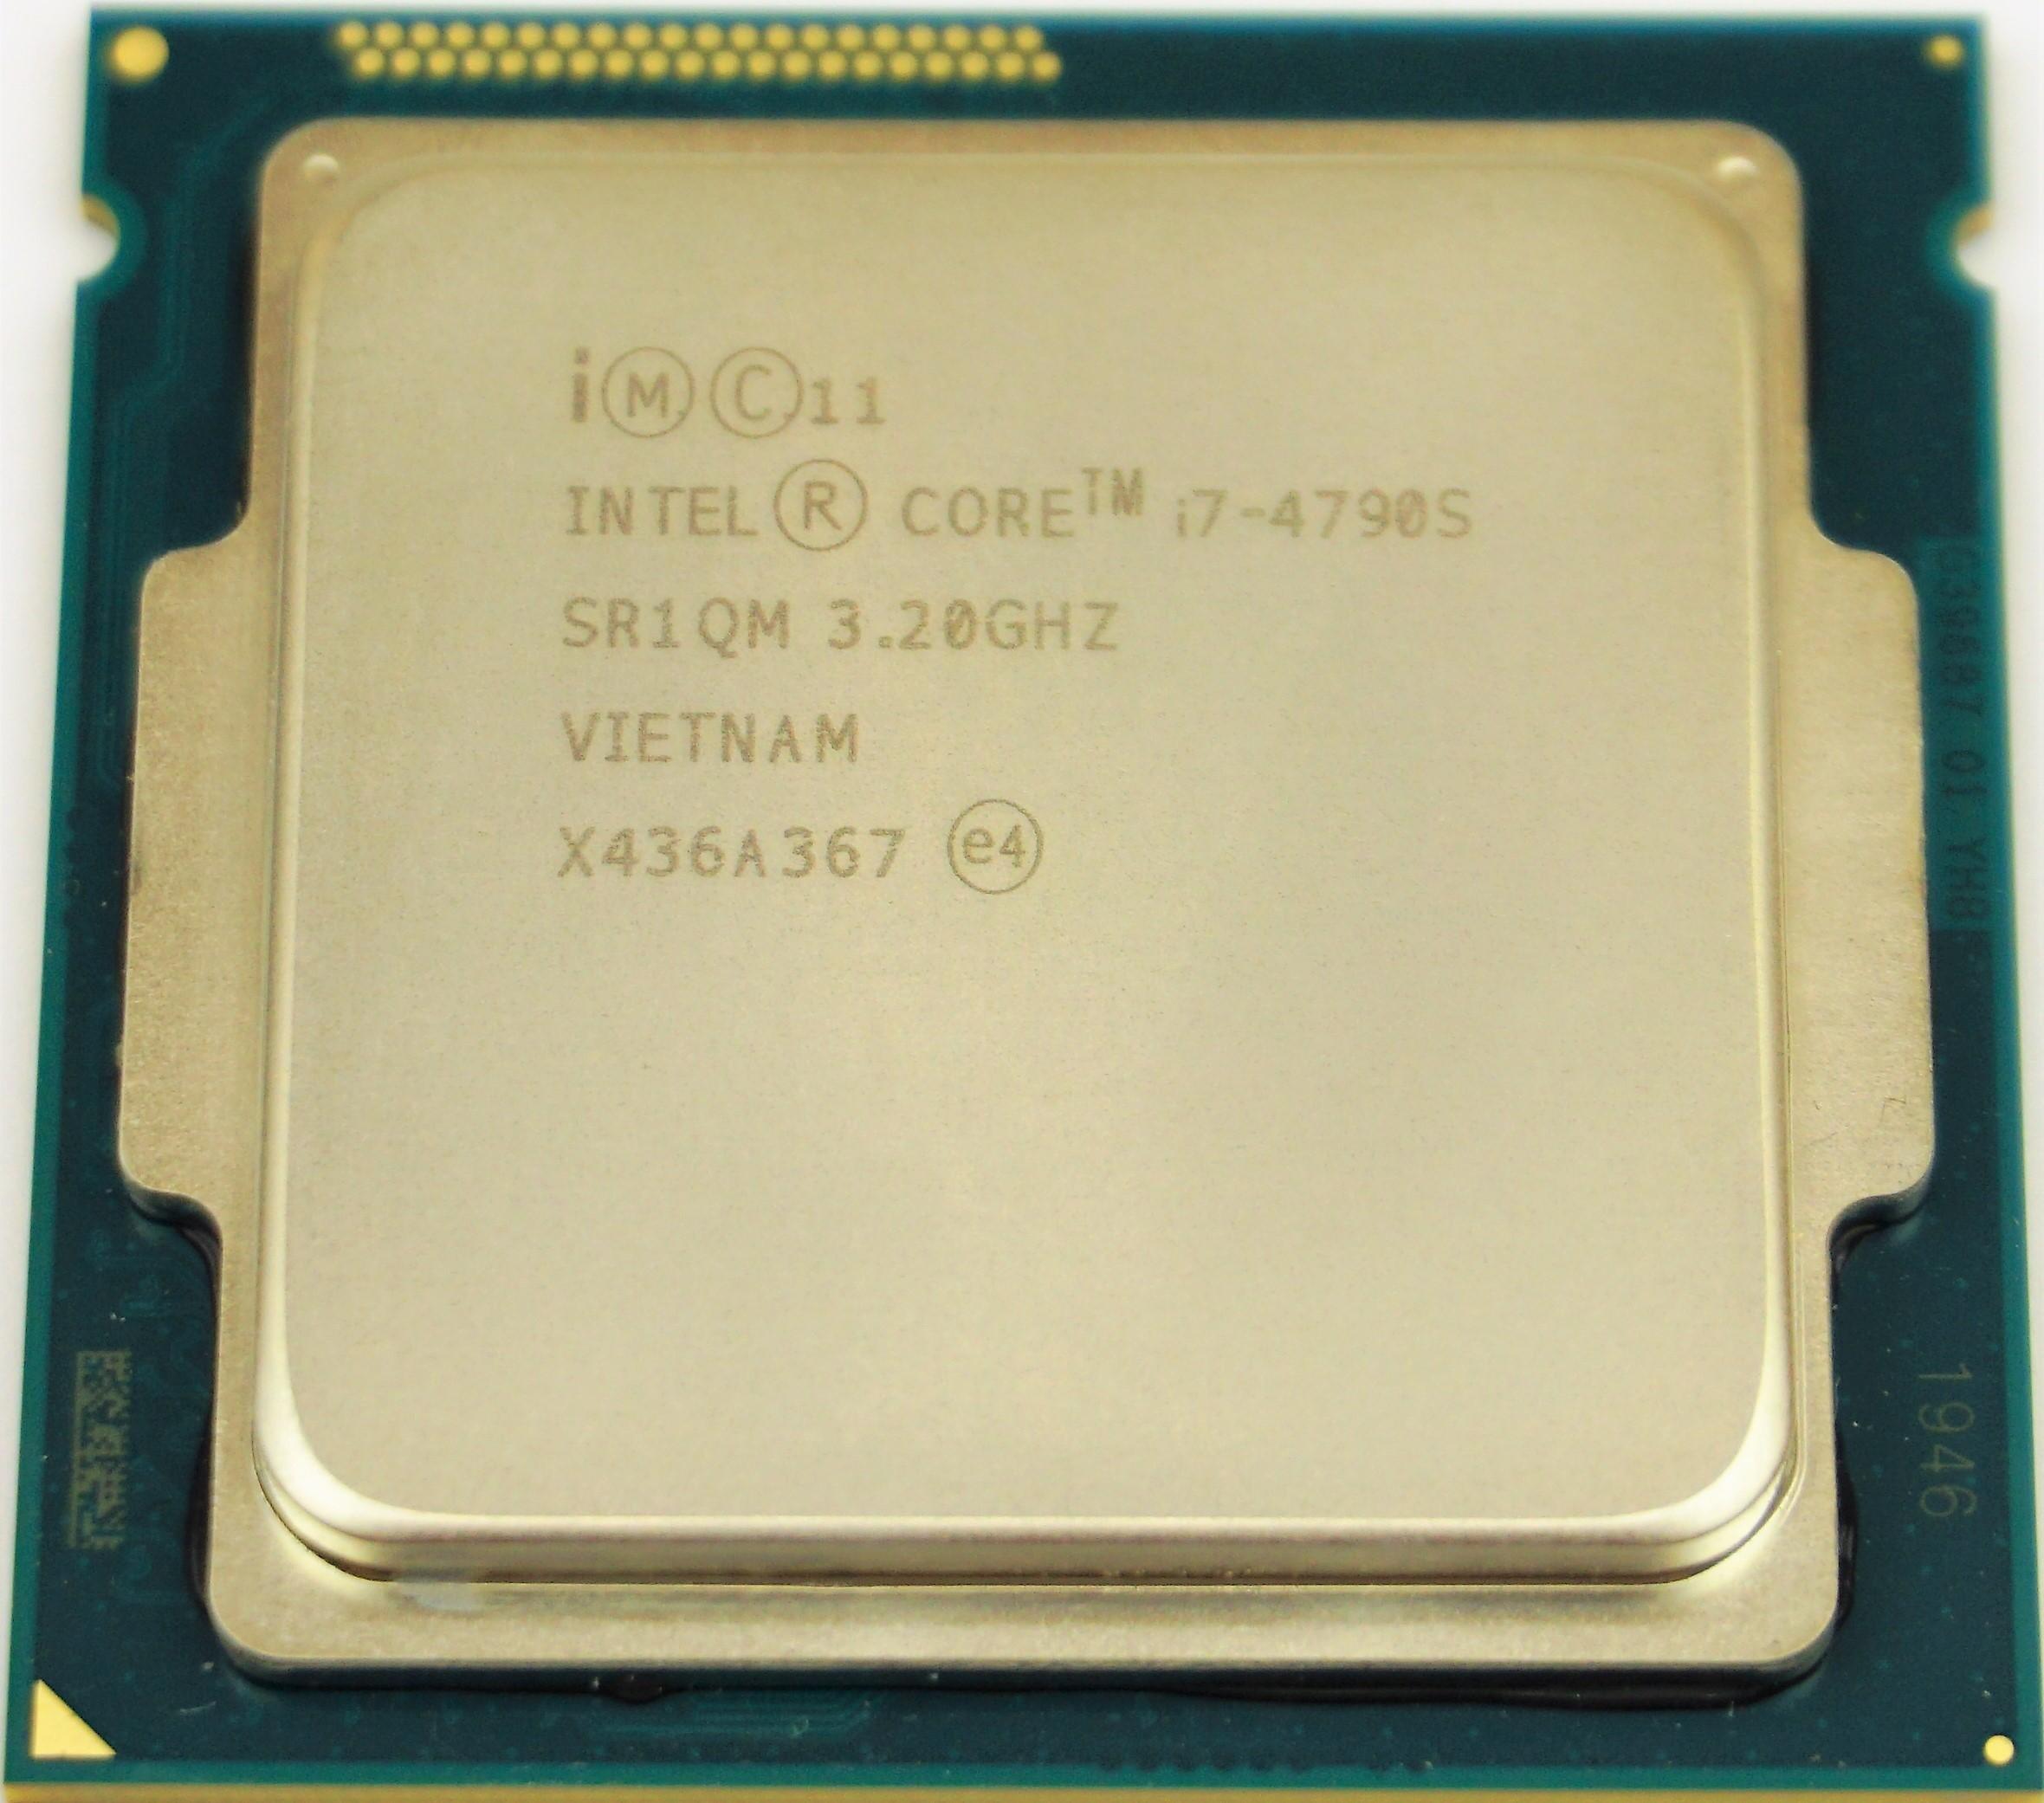 Intel Core i7-4790S (SR1QM) 3 20Ghz Quad (4) Core LGA1150 65W CPU